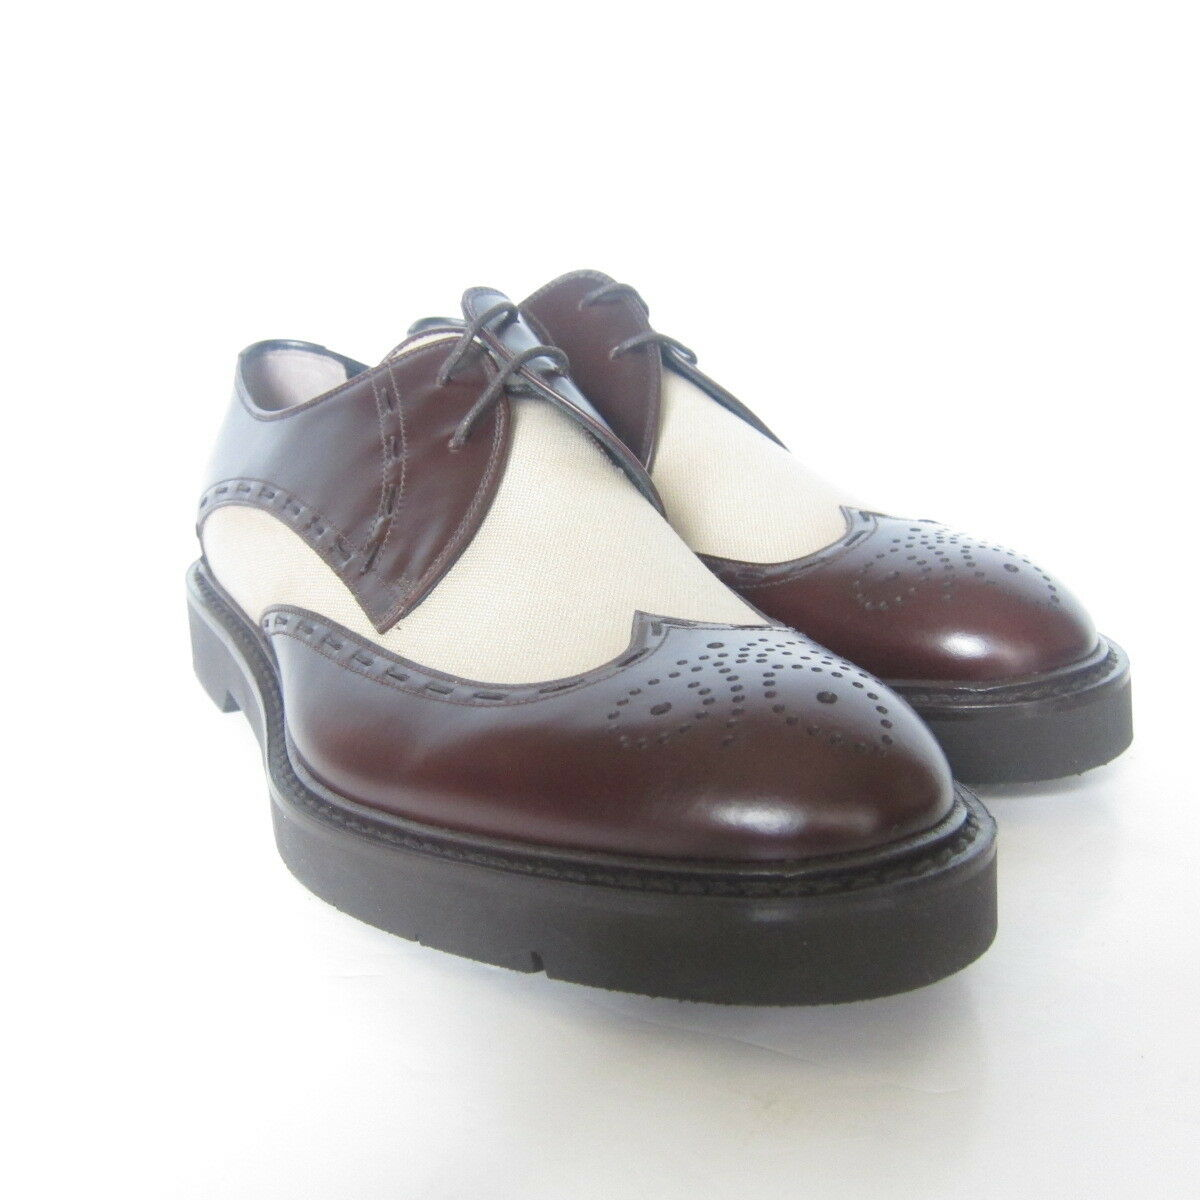 W-1925175 New Fendi Oxford Pelle/Fabric Brown/Sandy Size9 Fawn Shoe Size9 Brown/Sandy US-10 1b68ff